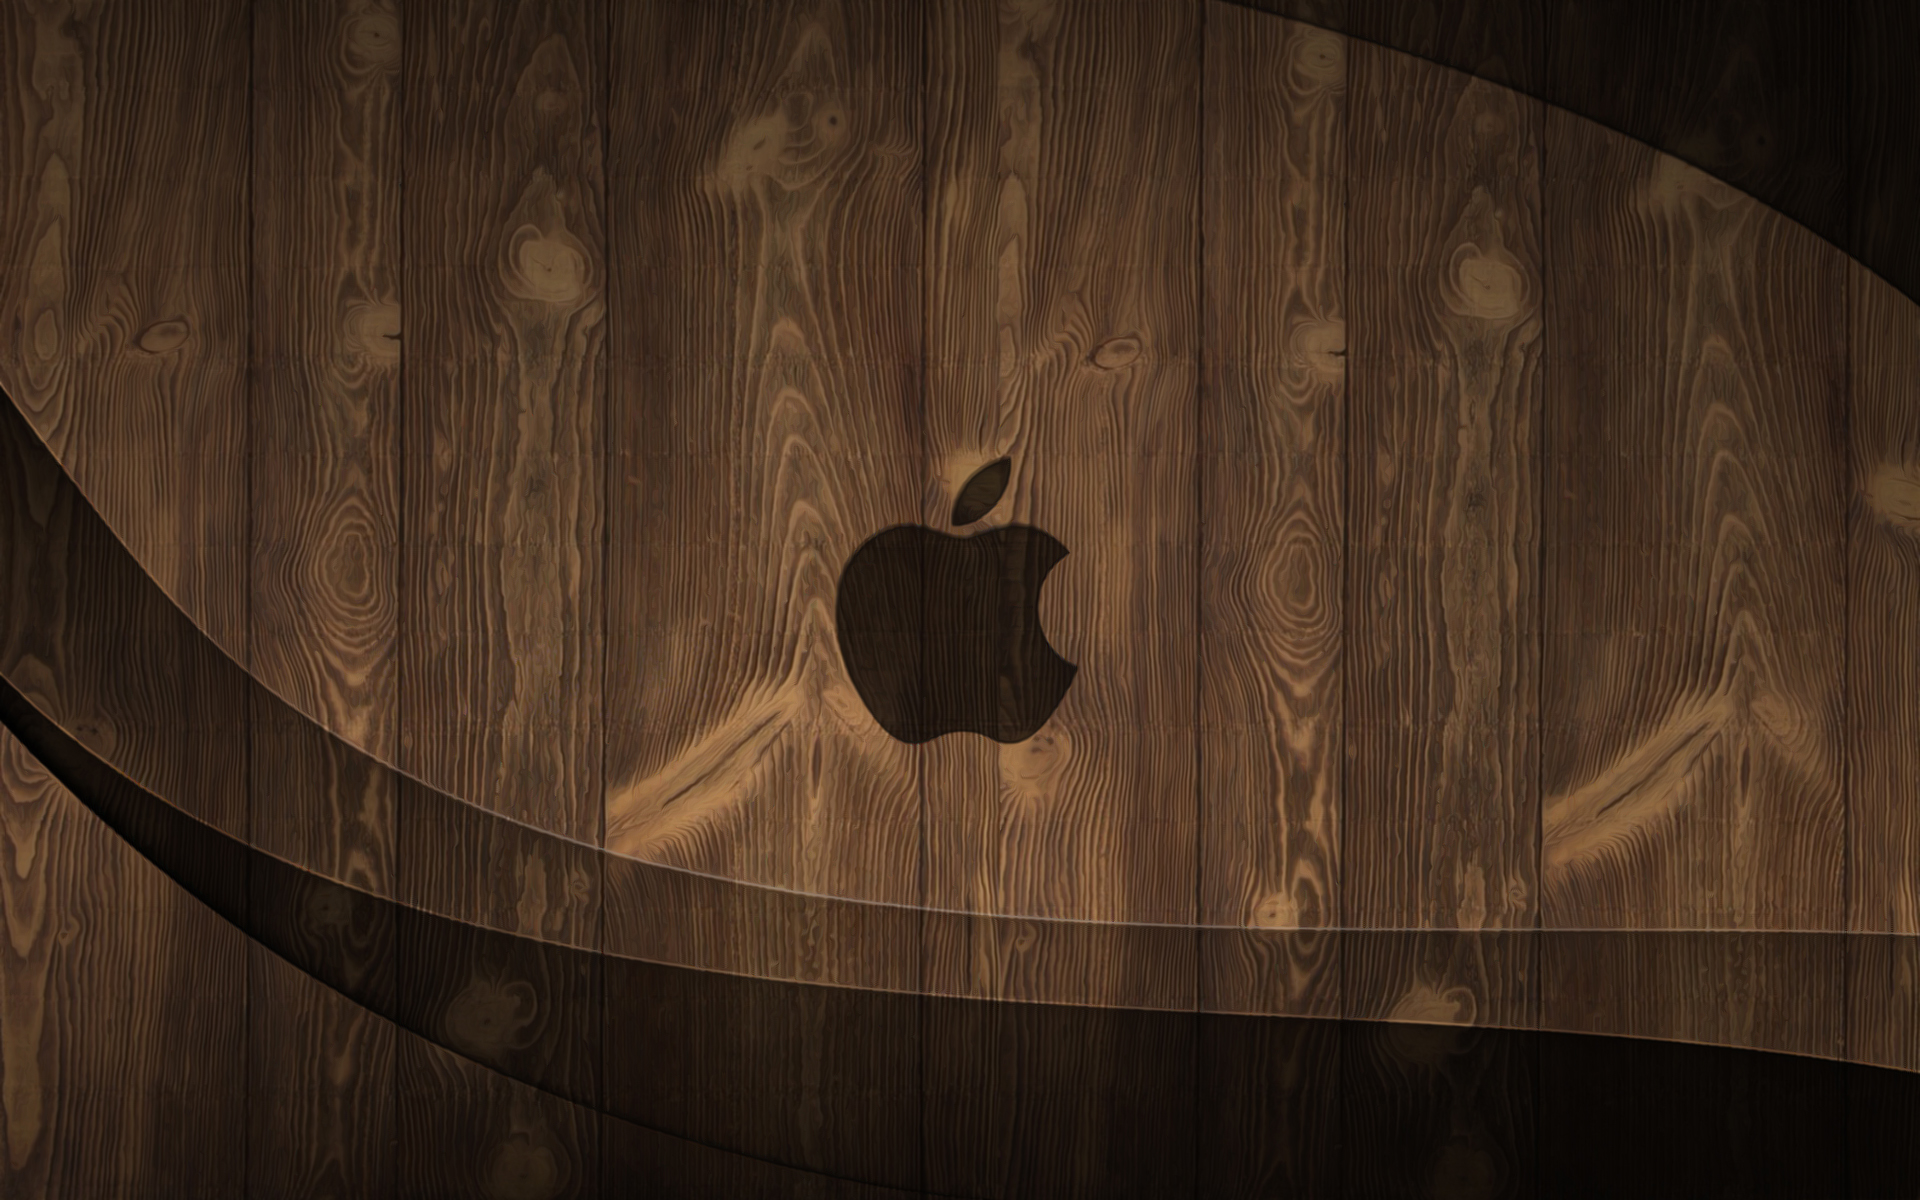 wooden apple by arthursmith